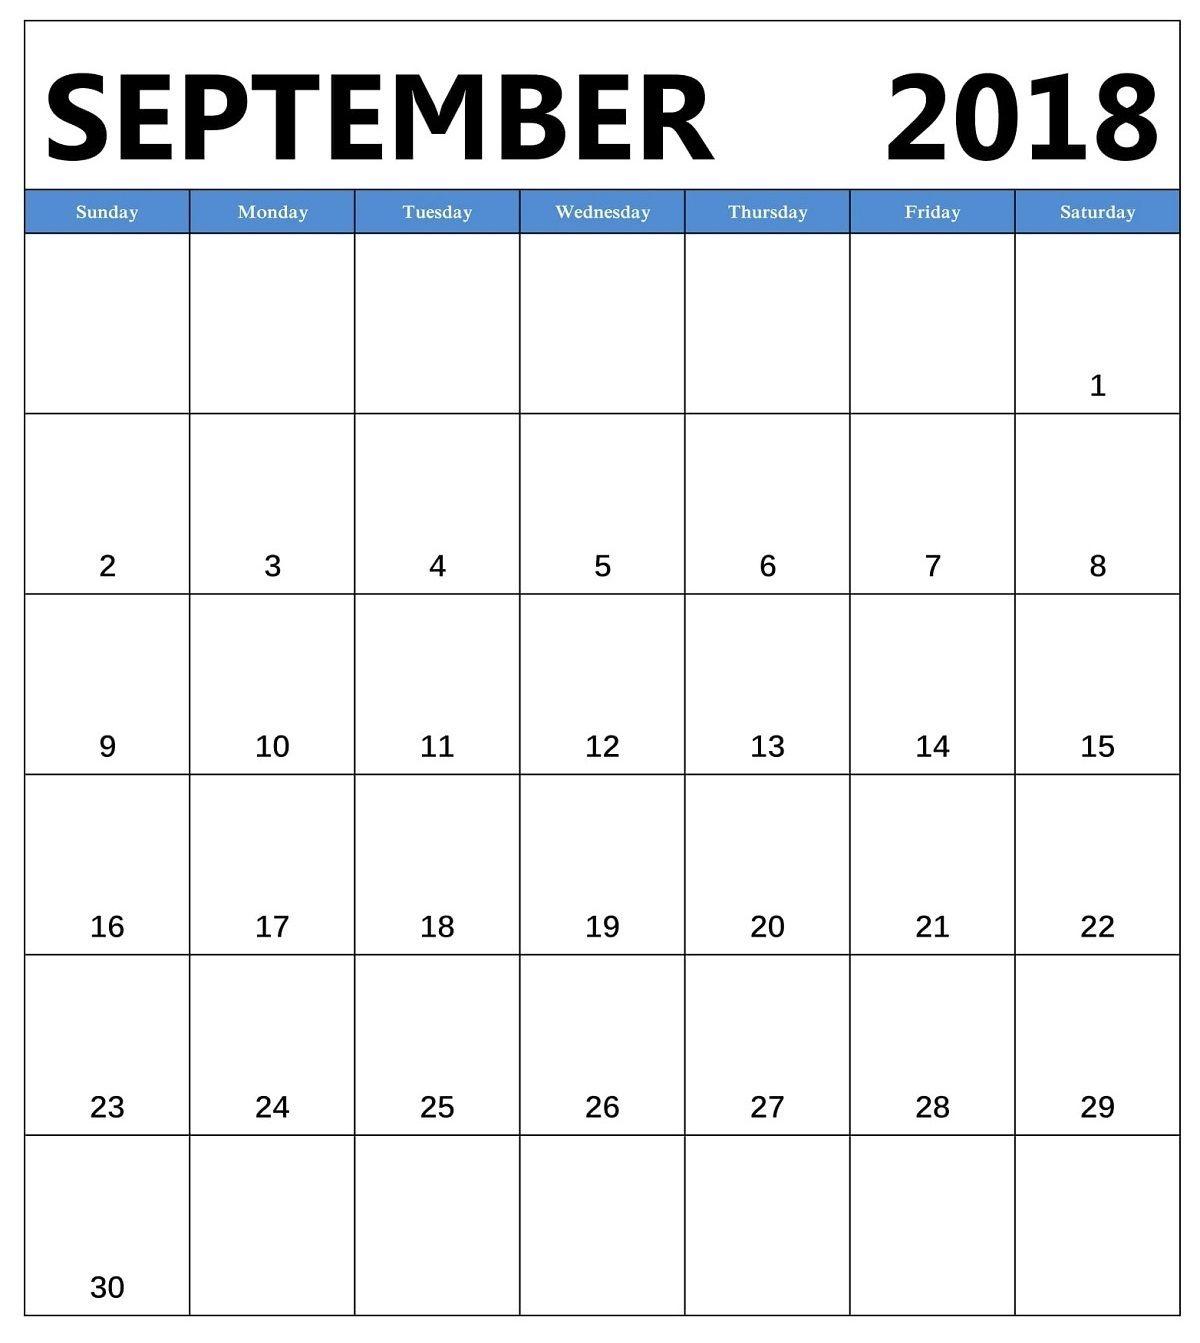 Free September Calendar A4 Size Landscape Vertical